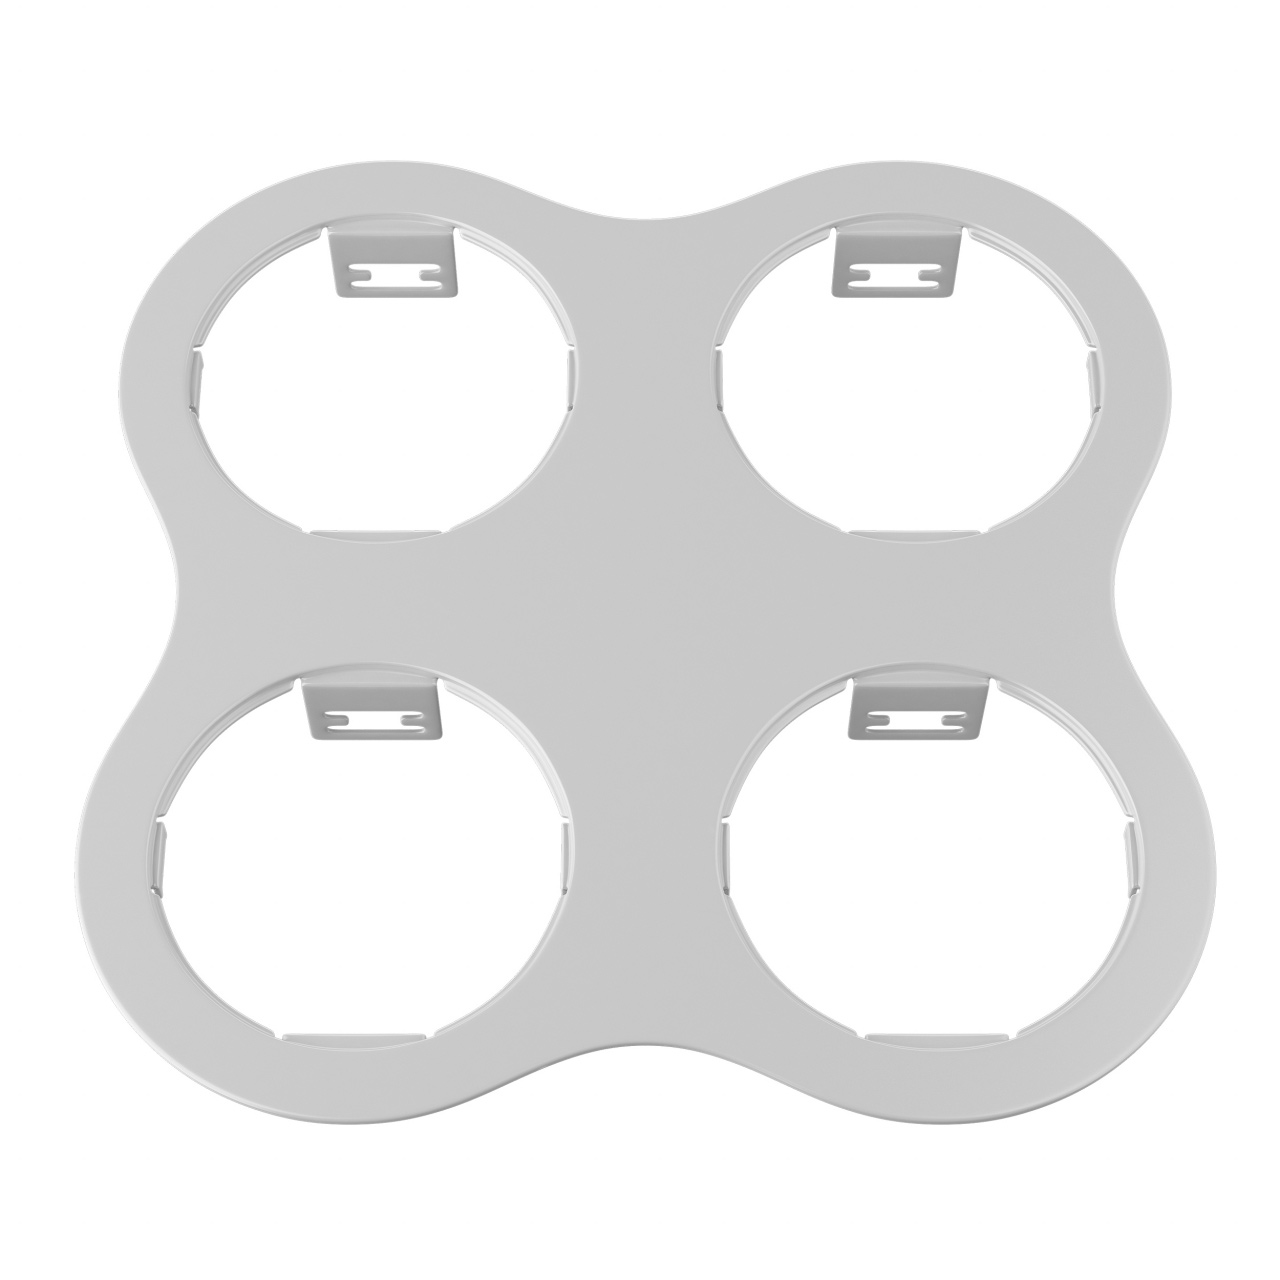 Рамка Domino round 2x2 МR16 белый Lightstar 214646